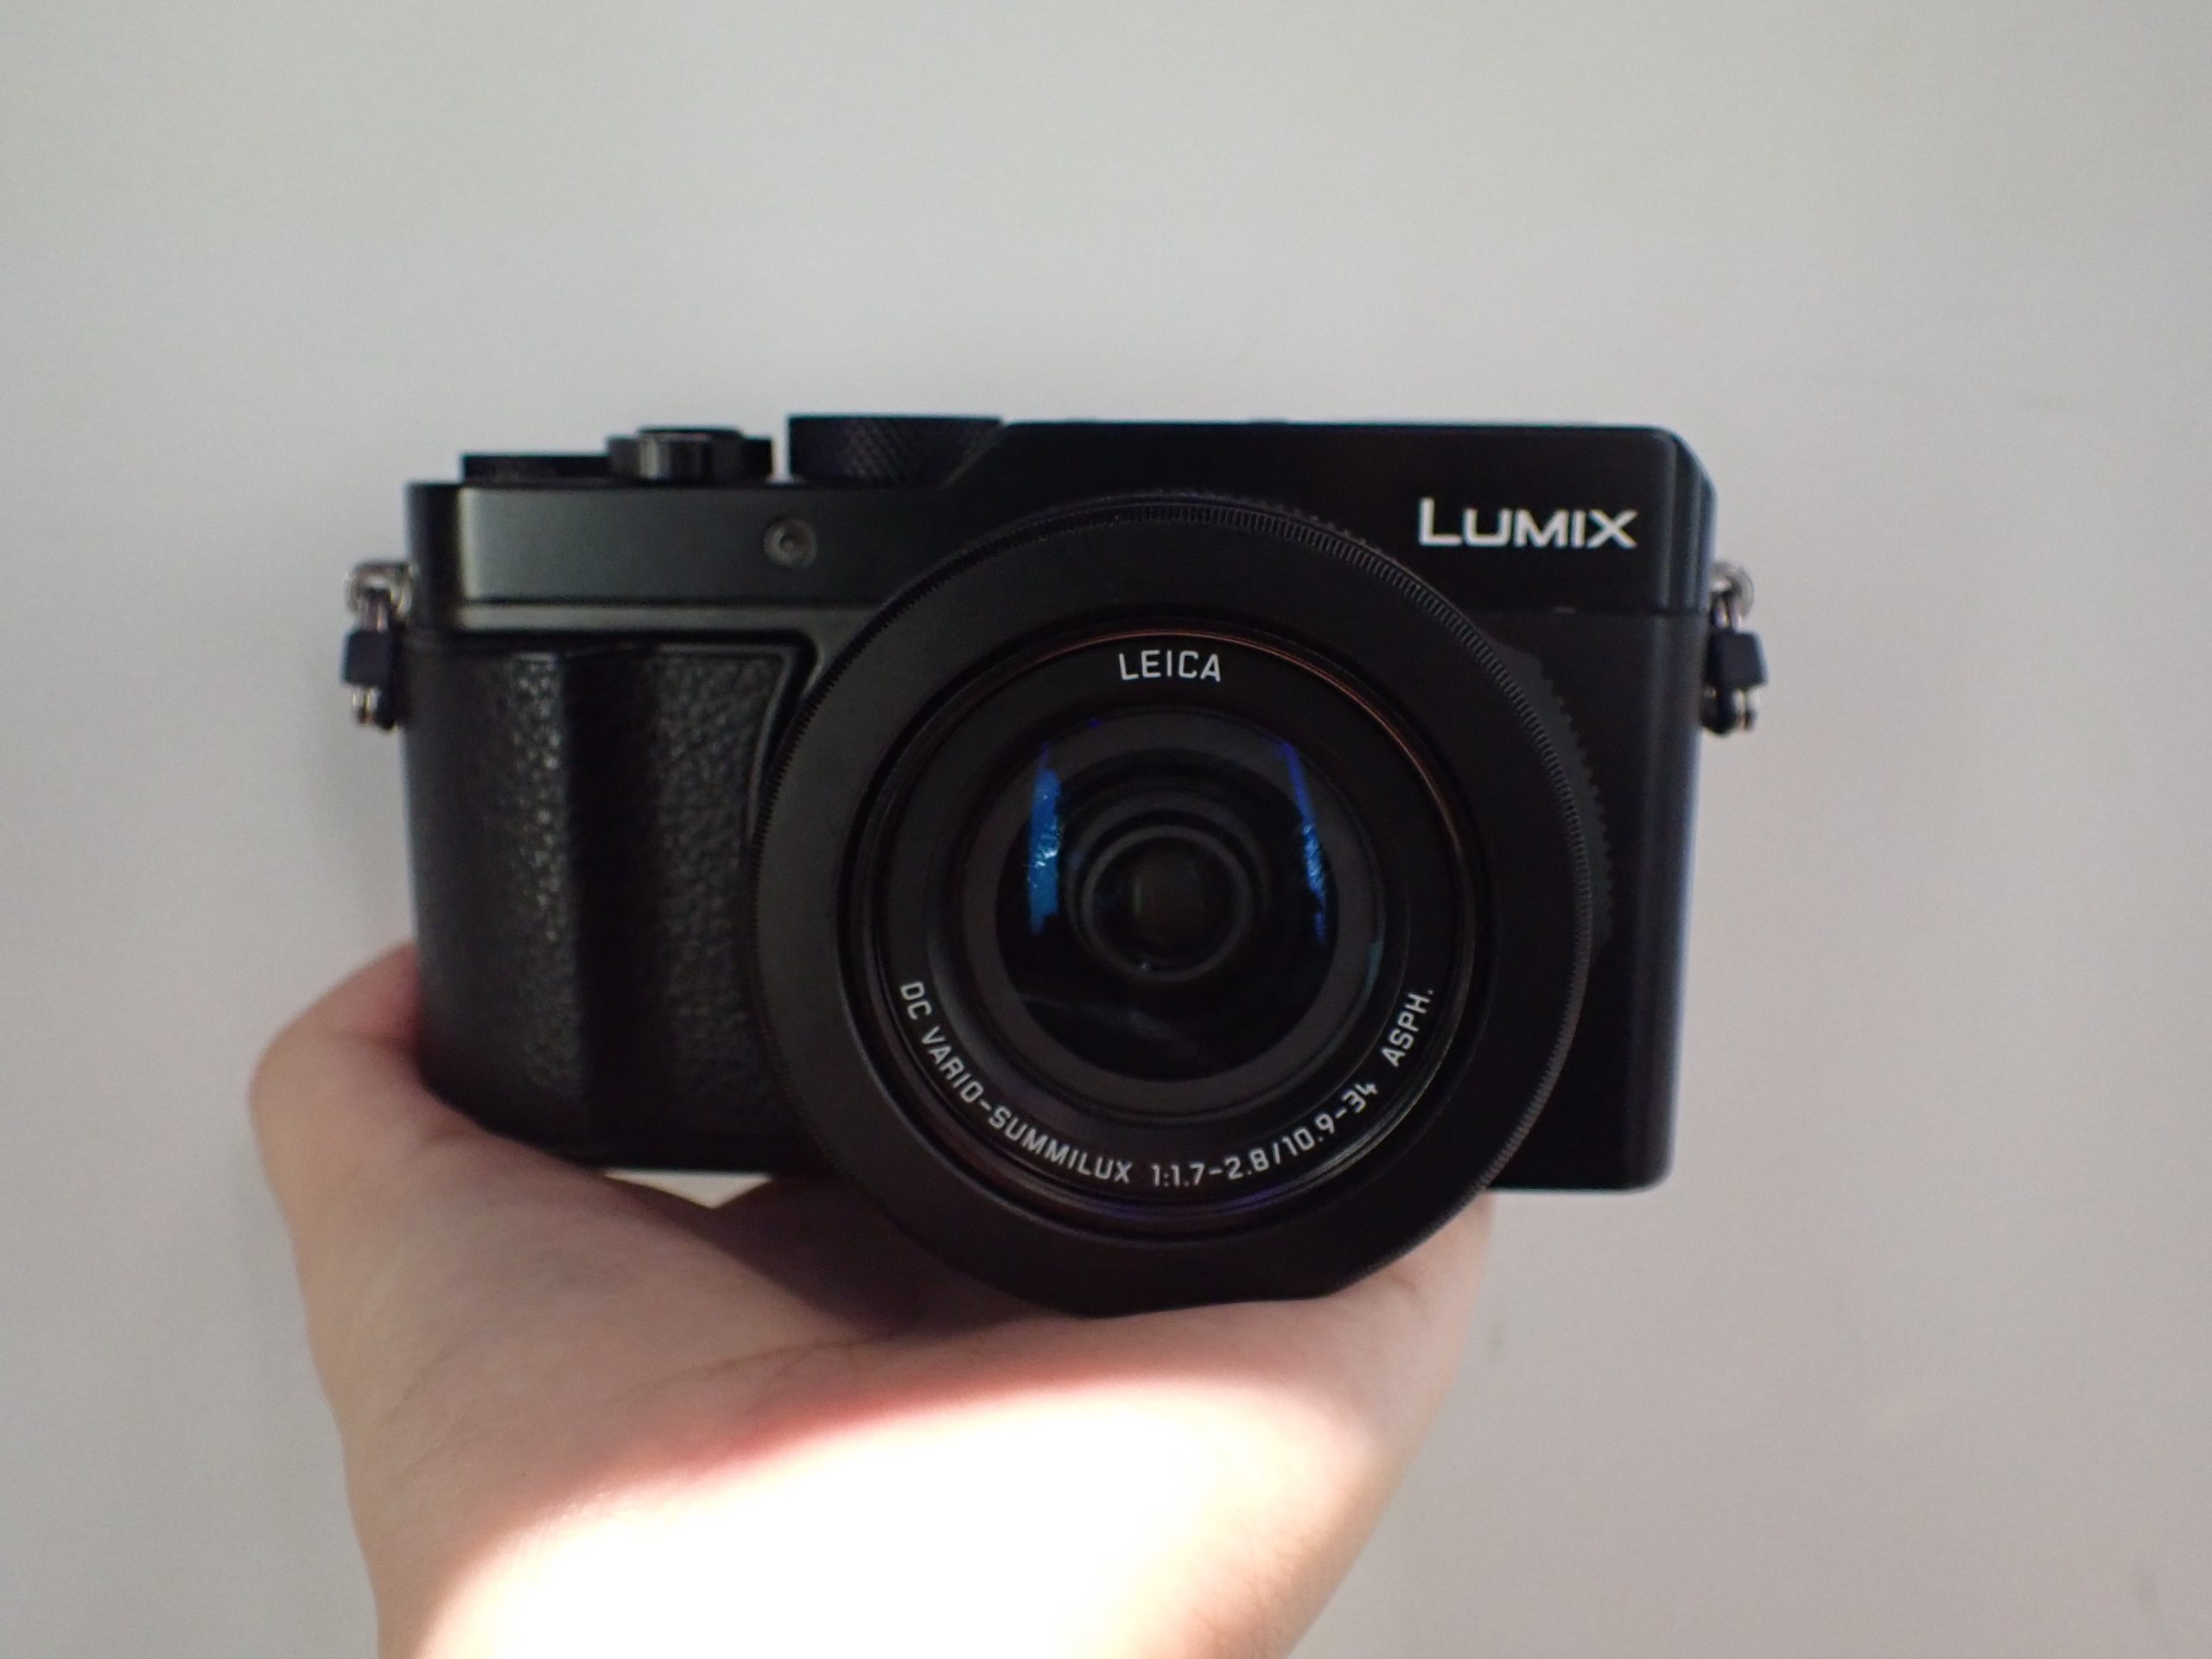 【Panasonic 】 LUMIX DC-LX100M2を使ってみよう!